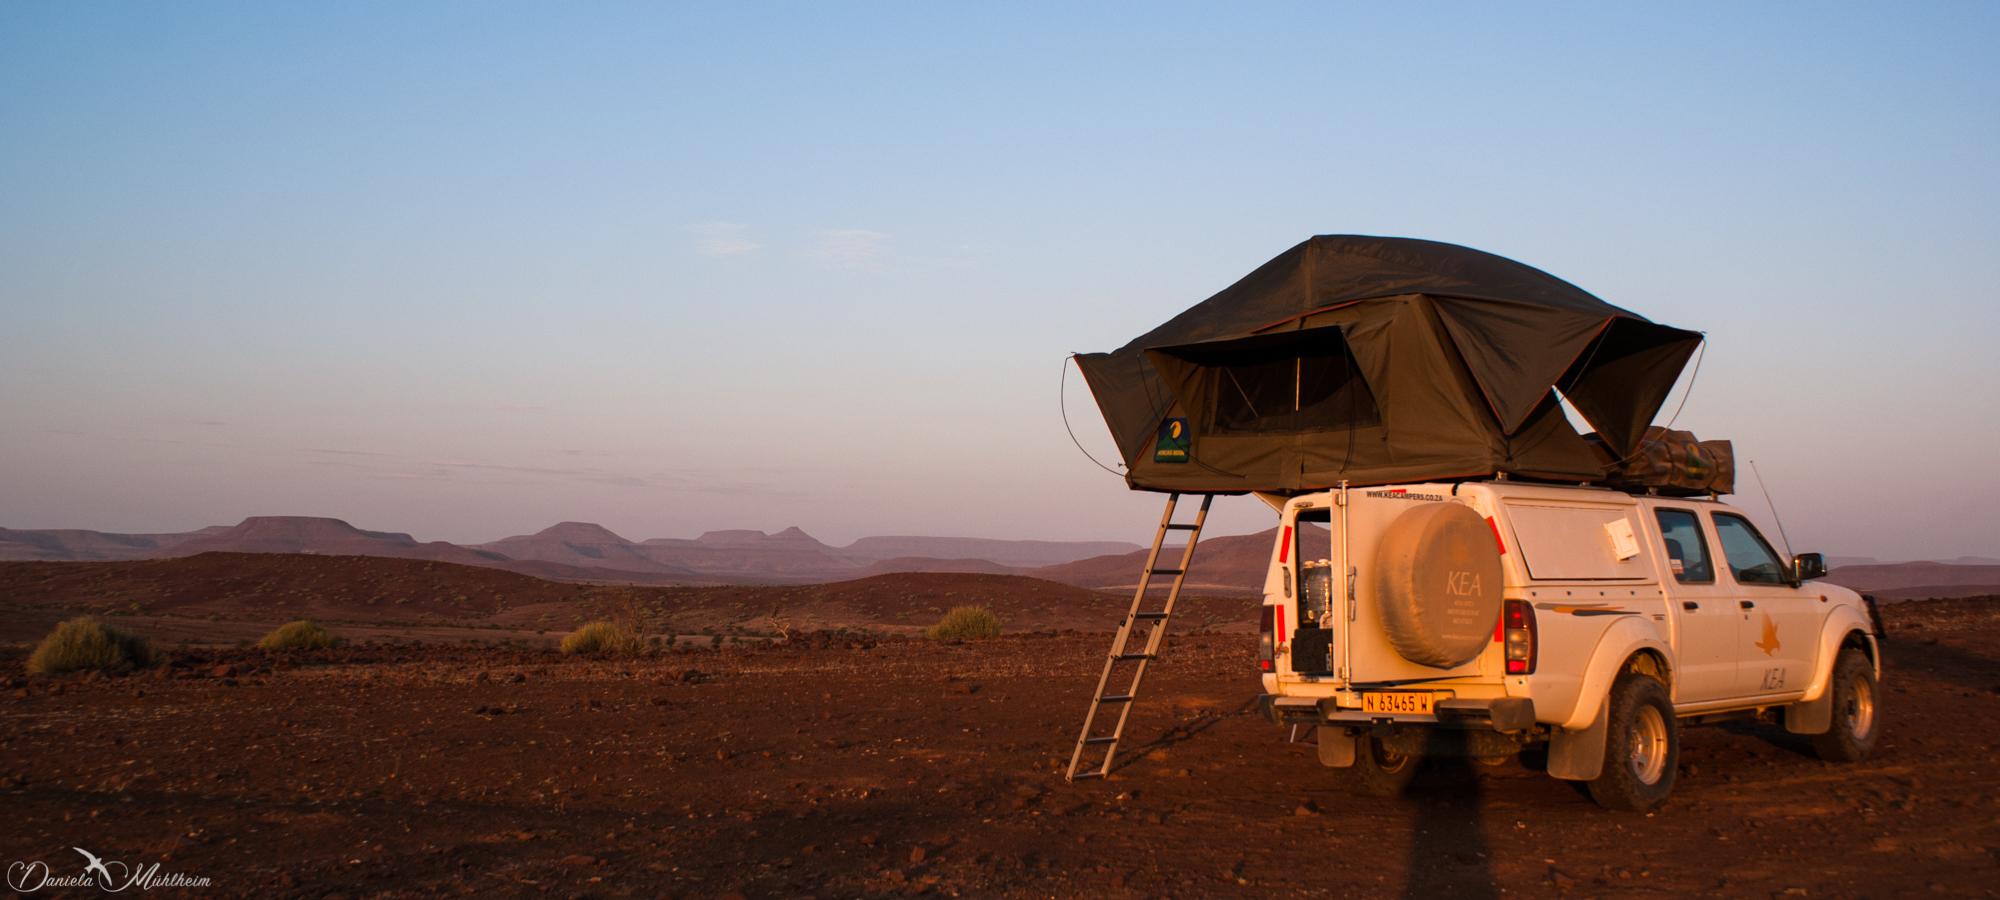 daniela, danielamühlheim, muehlheim, ladybird, exploring, earth, abundance, nature, africa, namibia,